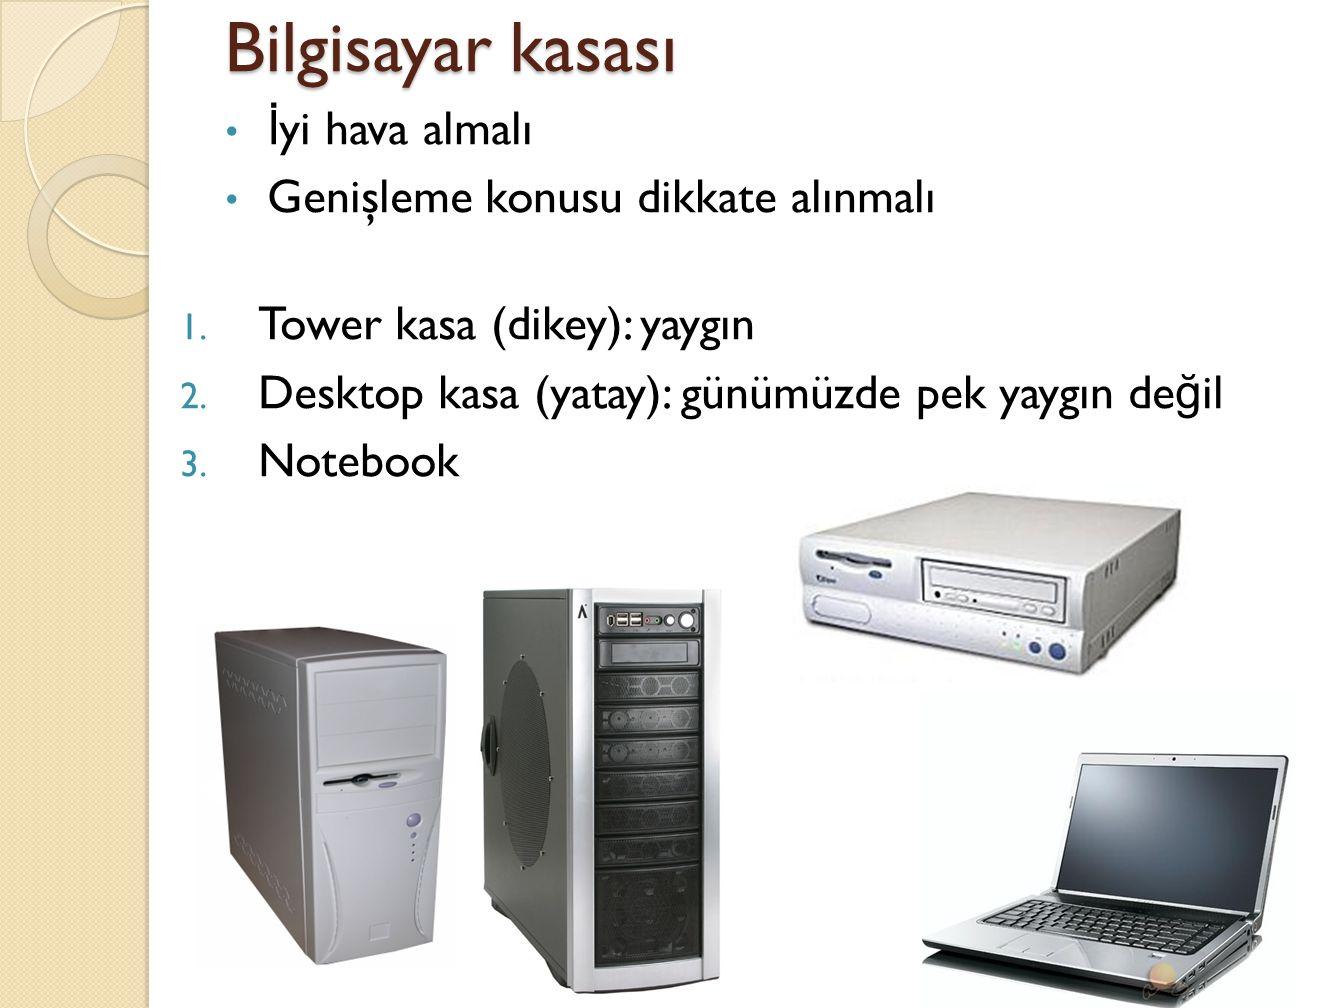 Bilgisayar kasası 1.Tower kasa (dikey): yaygın 2.